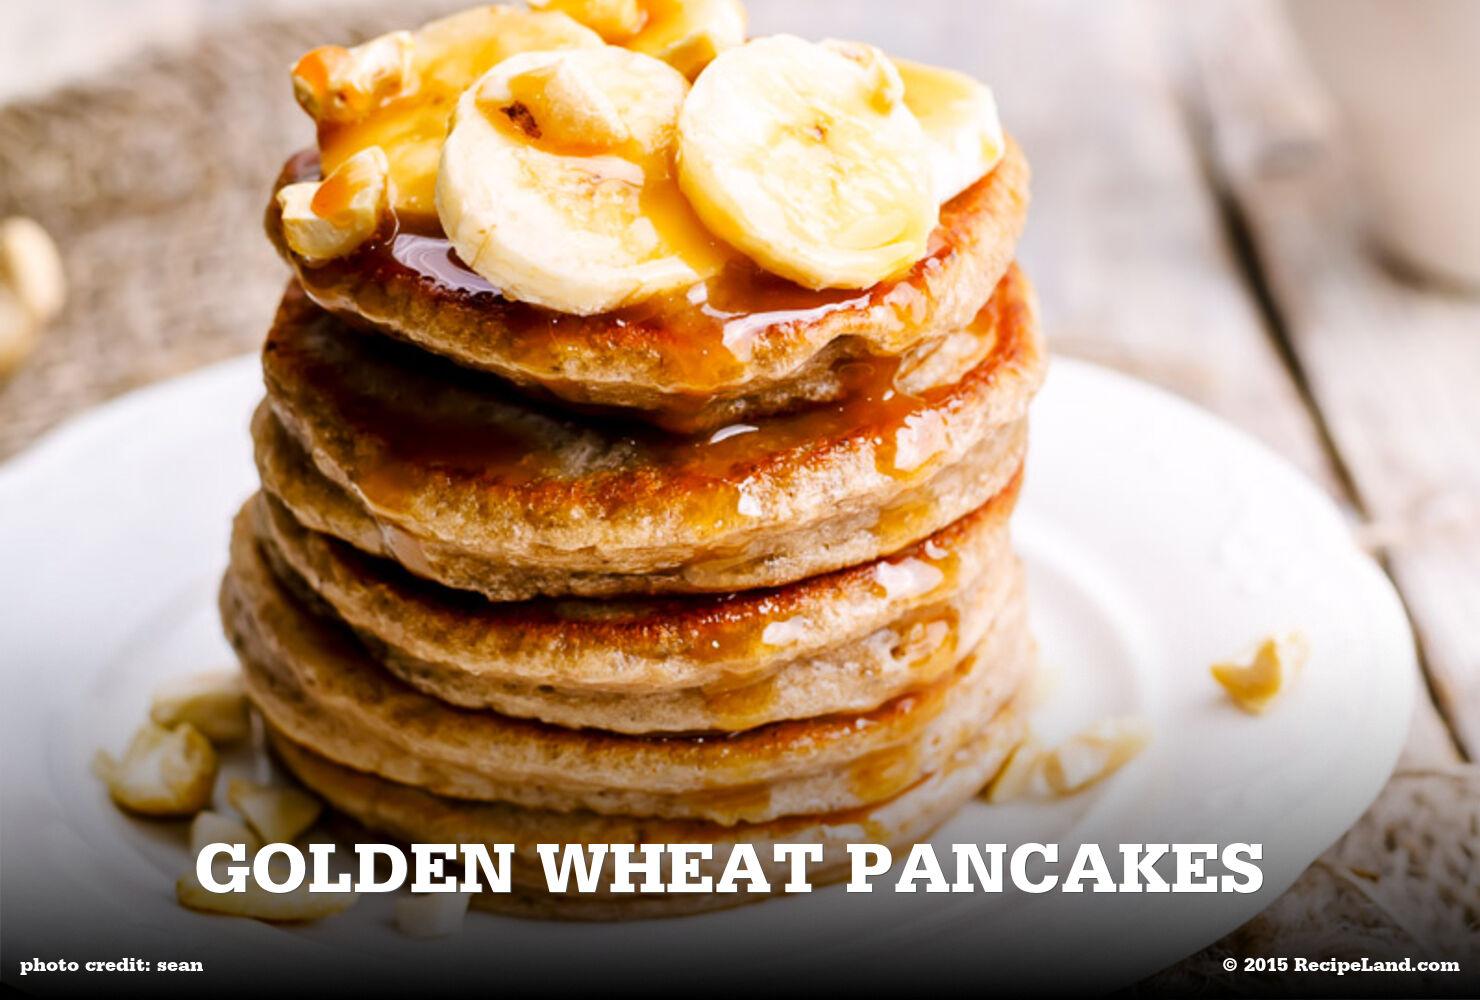 Golden Wheat Pancakes